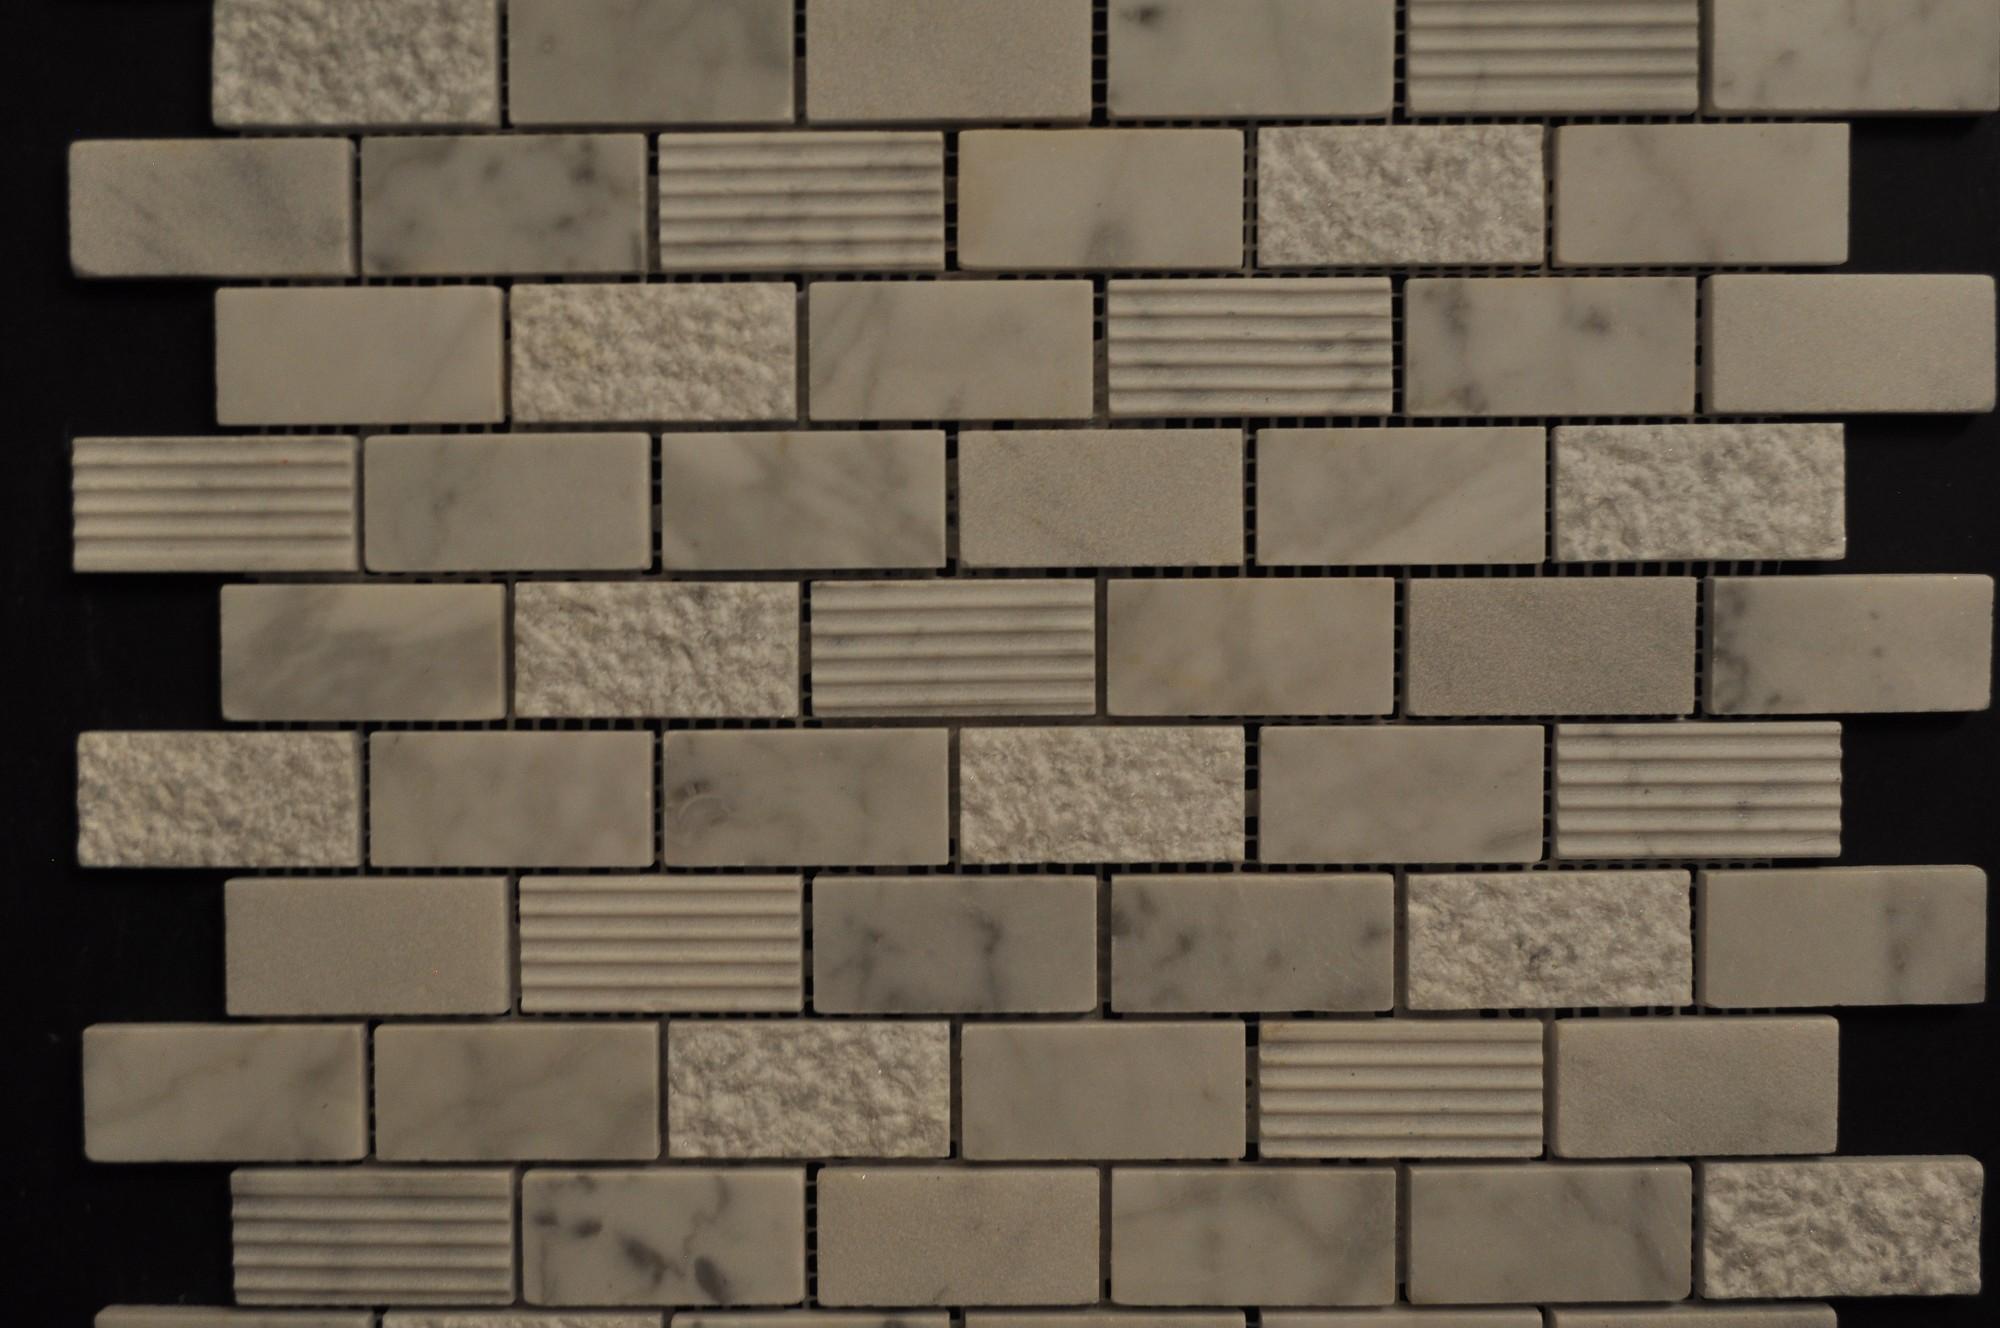 Carrara White Marble Brick Pattern Mixed Surfaces